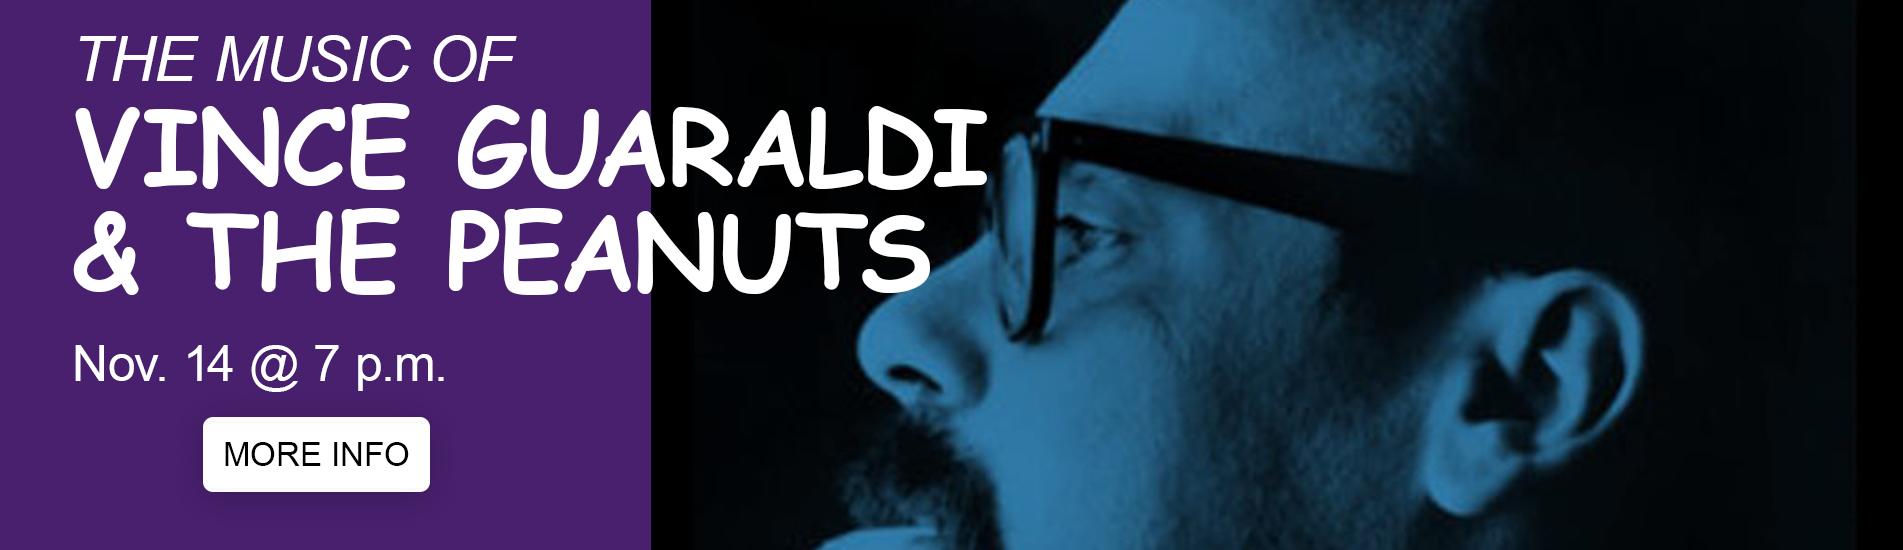 The Music Vince Guraldi and the peanuts concert November 14th at 7pm